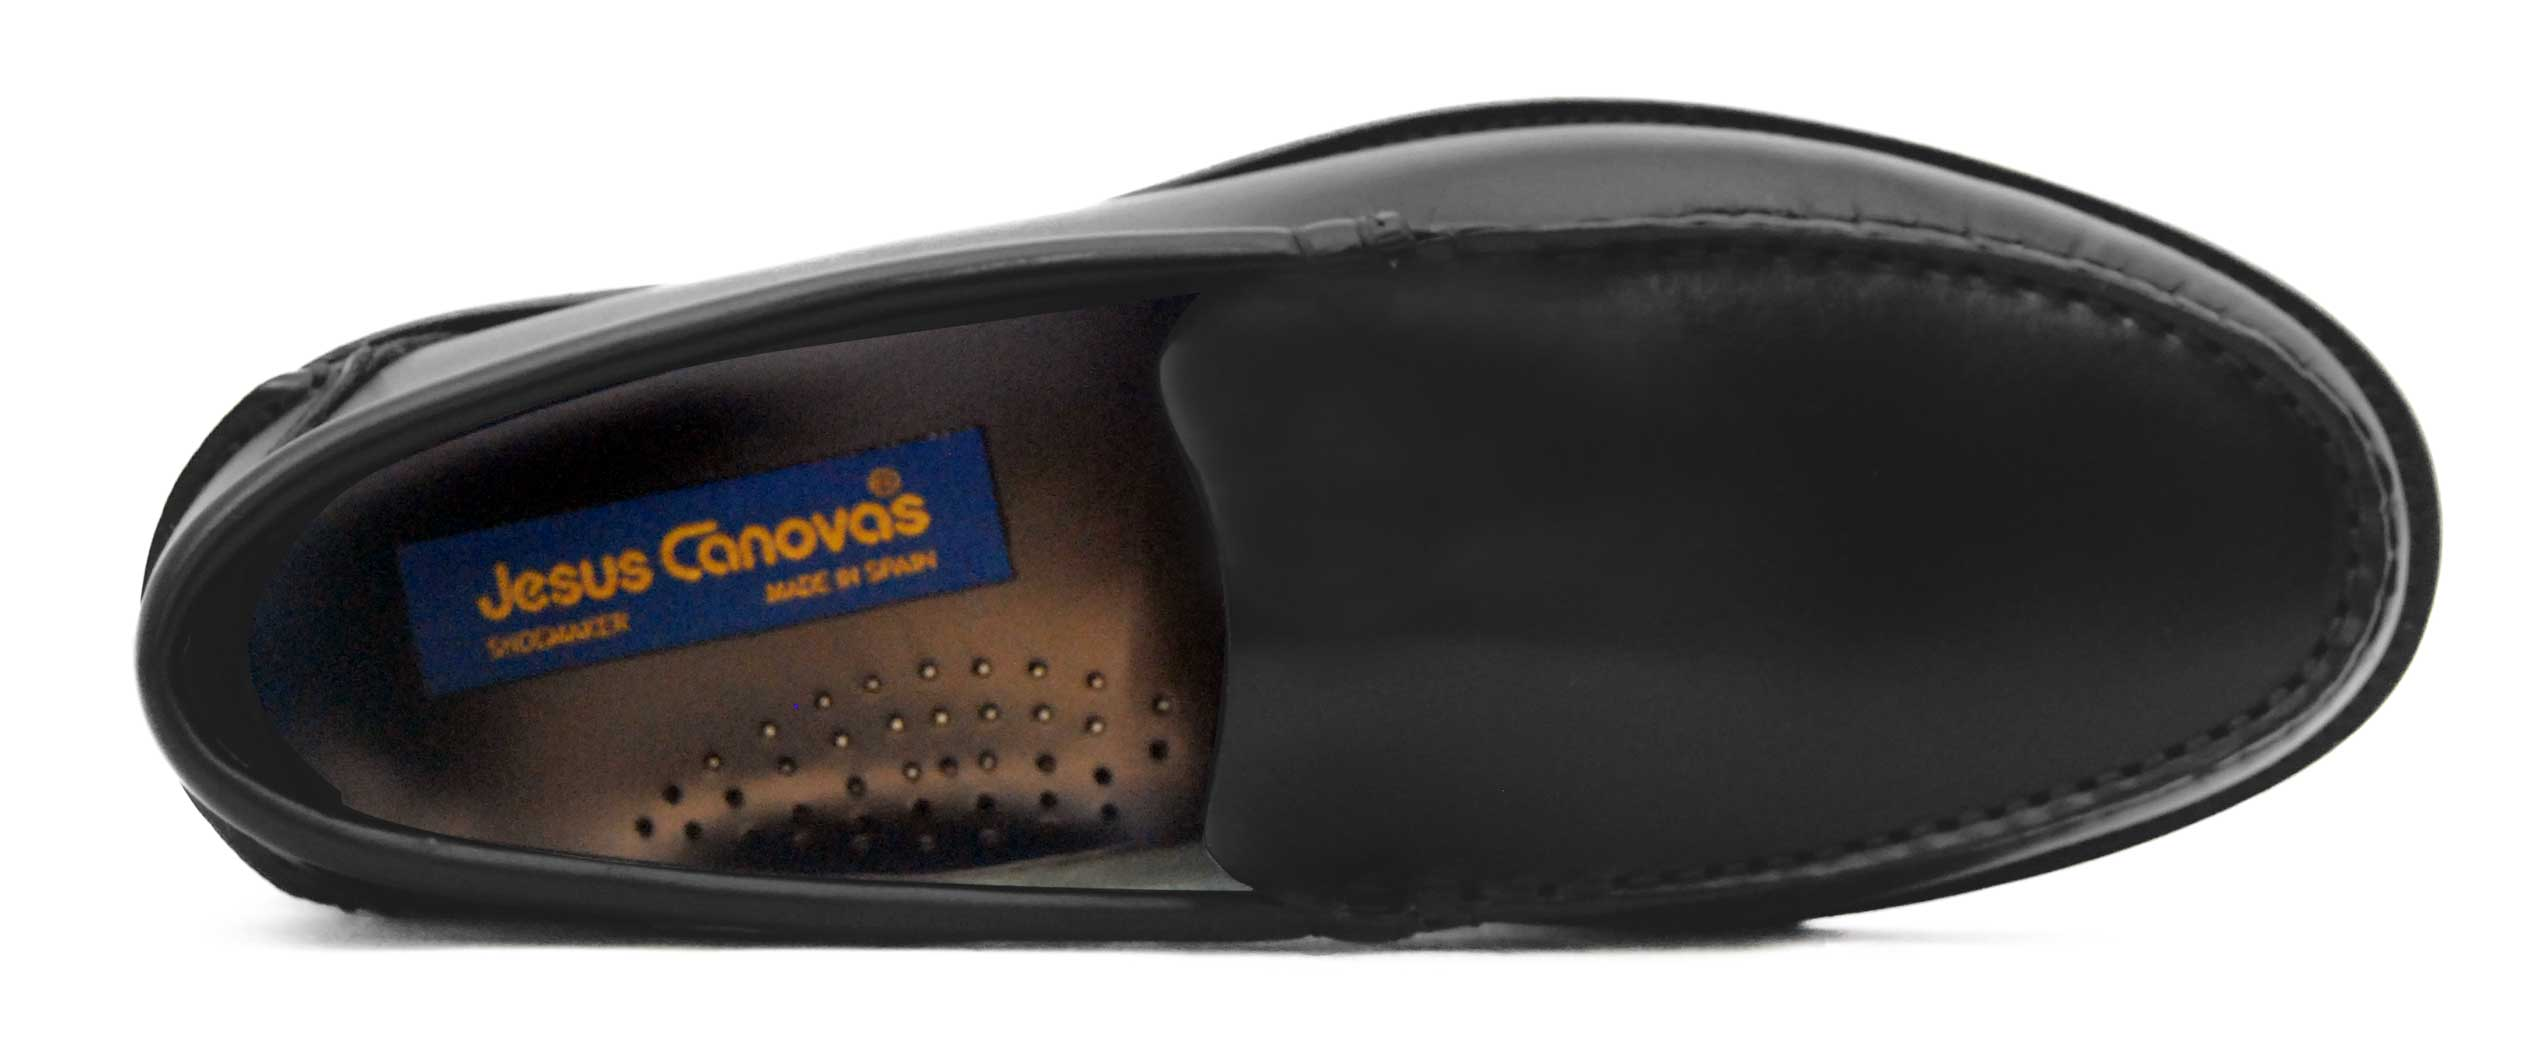 Foto 2 de Zapato Castellano 102 Liso Negro Botones